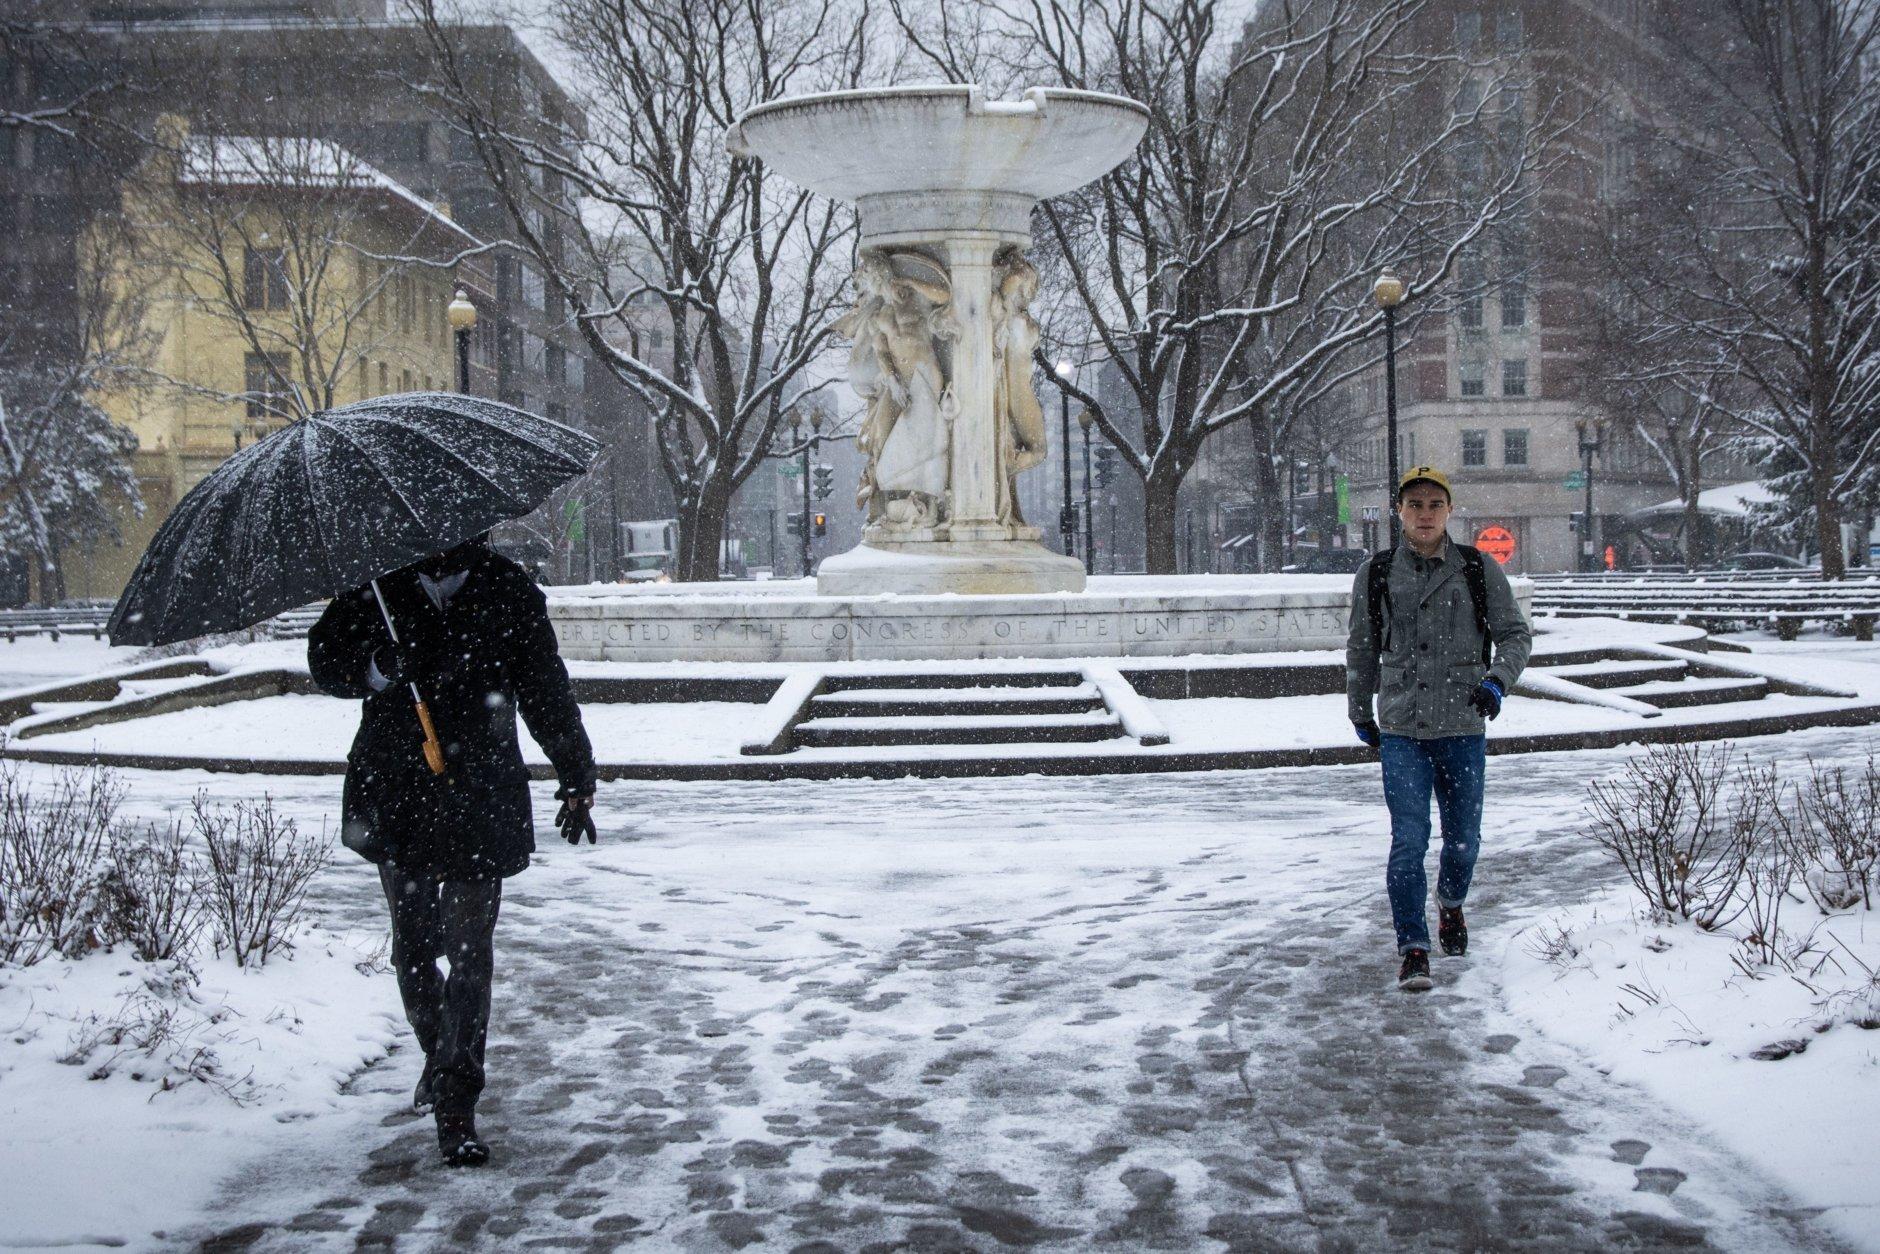 Dupont Circle's fountain in the snow. (WTOP/Alejandro Alvarez)